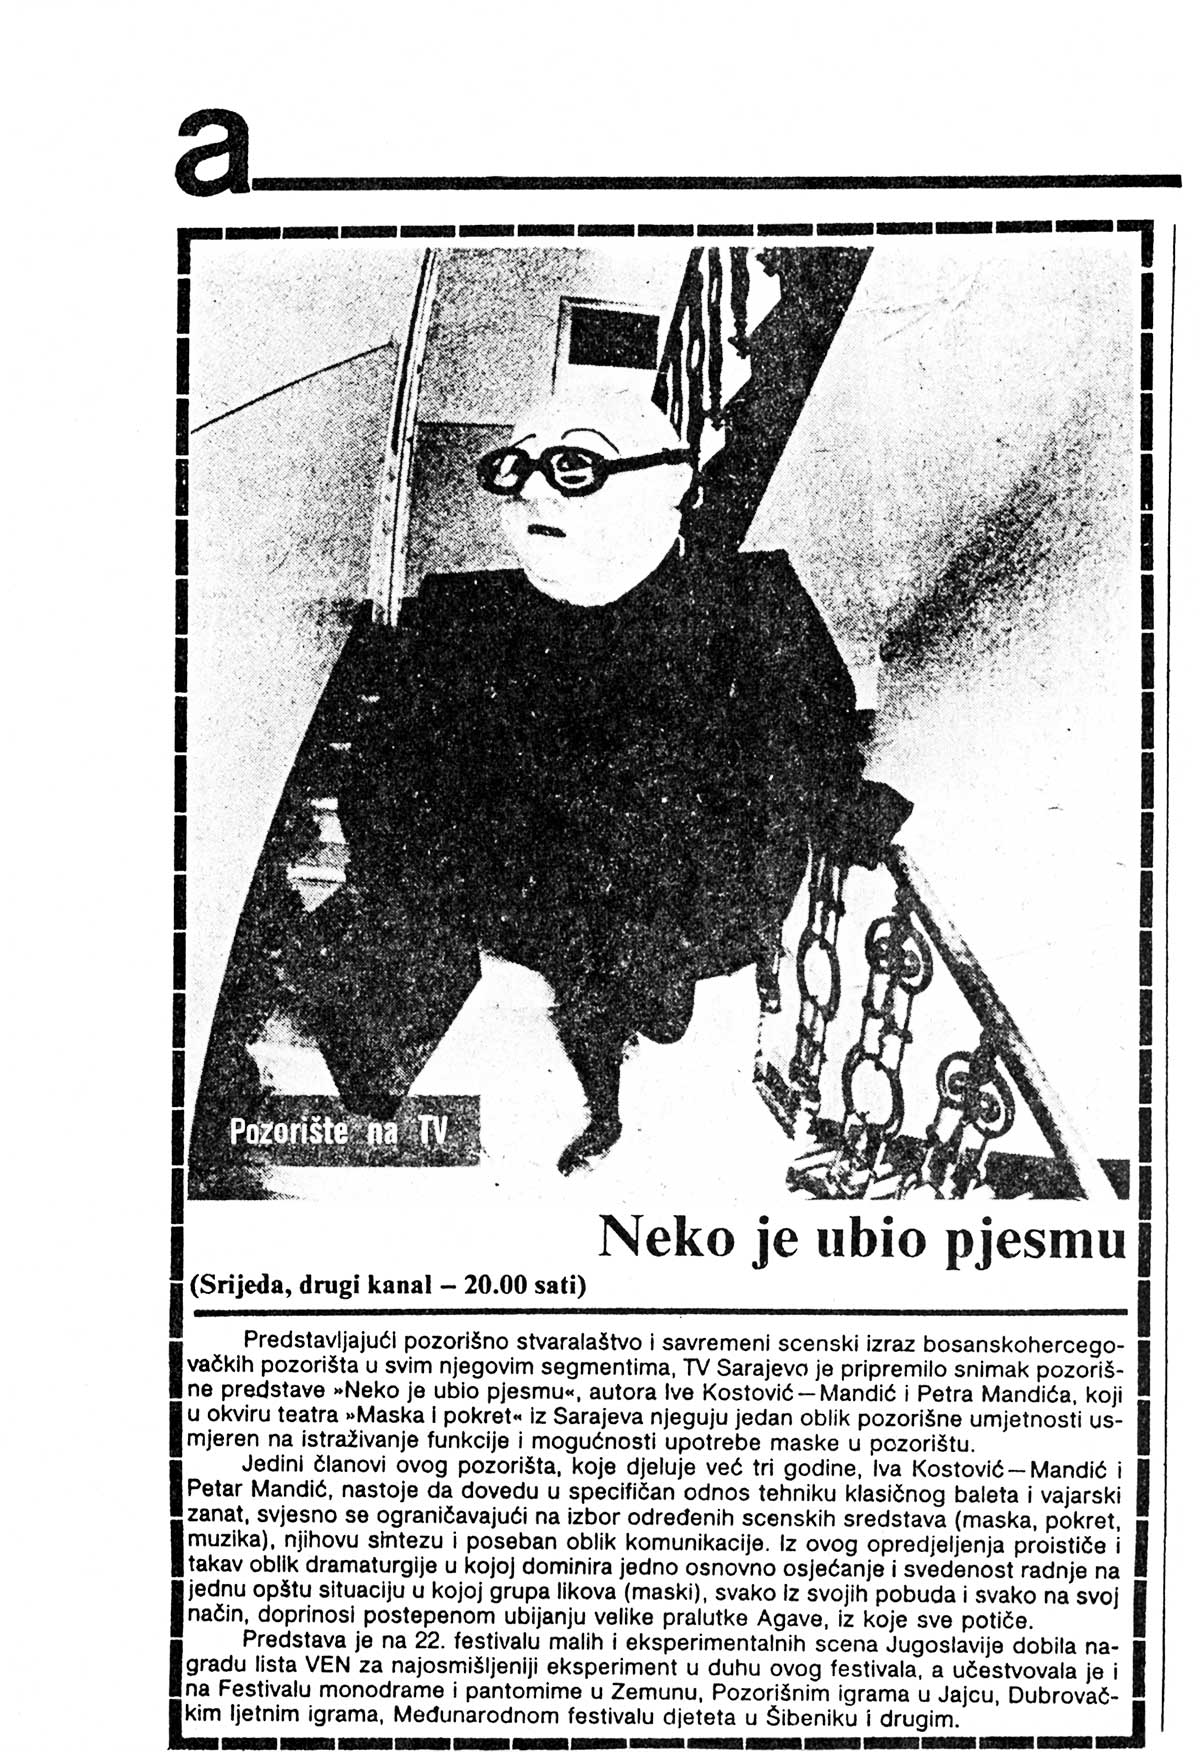 Press: Theatre Maska i Pokret - Somebody has Killed the Play - SOMEBODY HAS KILLED THE PLAY ON TV - TV Sarajevo